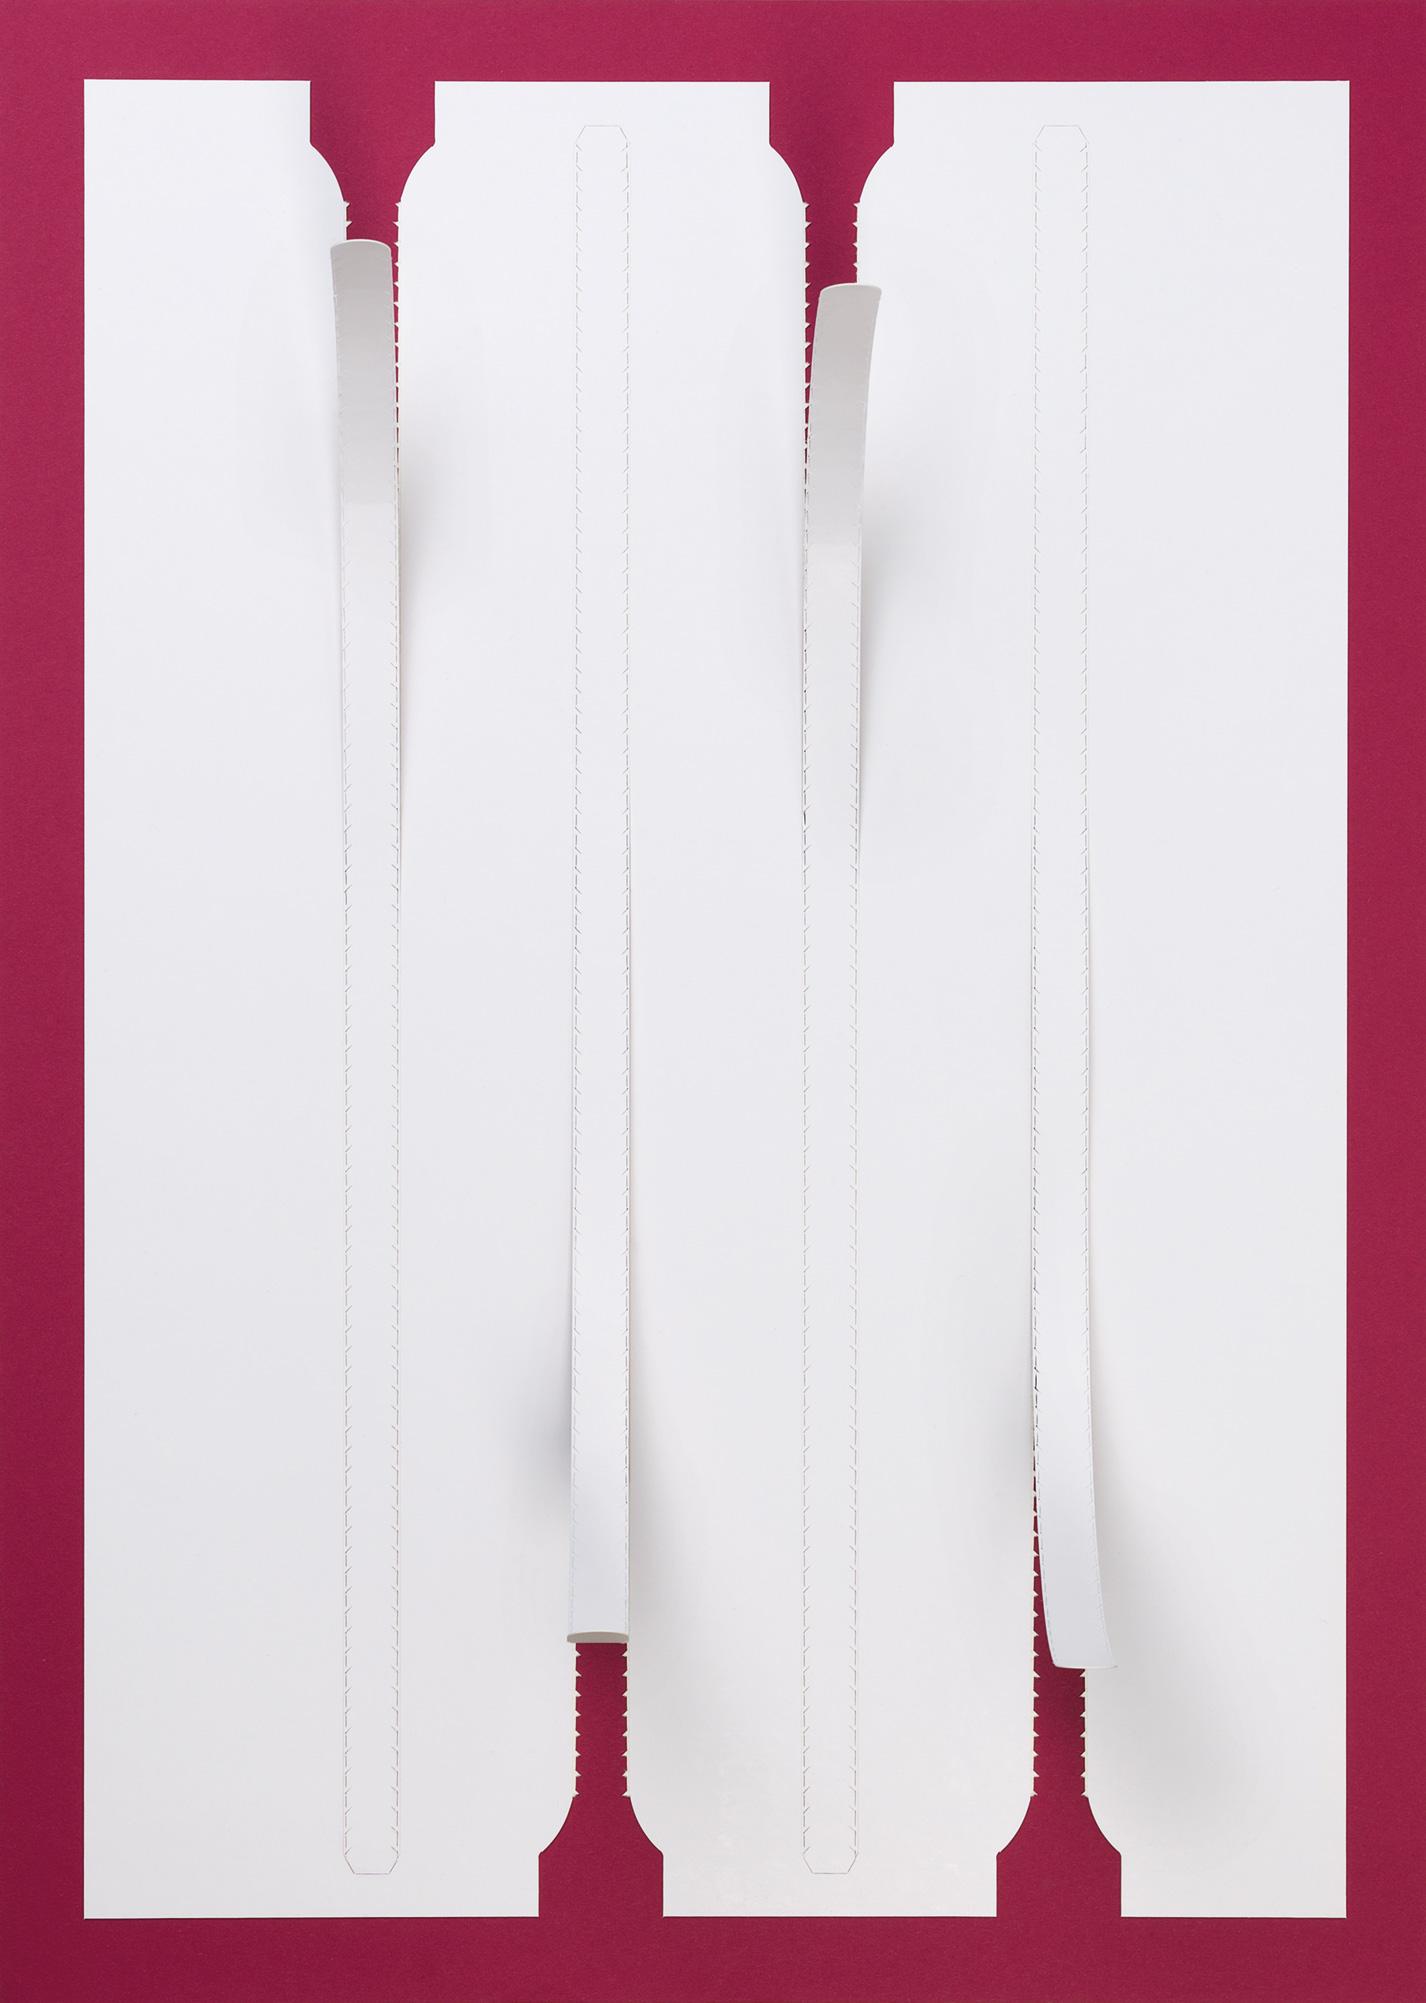 Mayr-Melnhof Geschäftsbericht Sujet Artwork Zipper